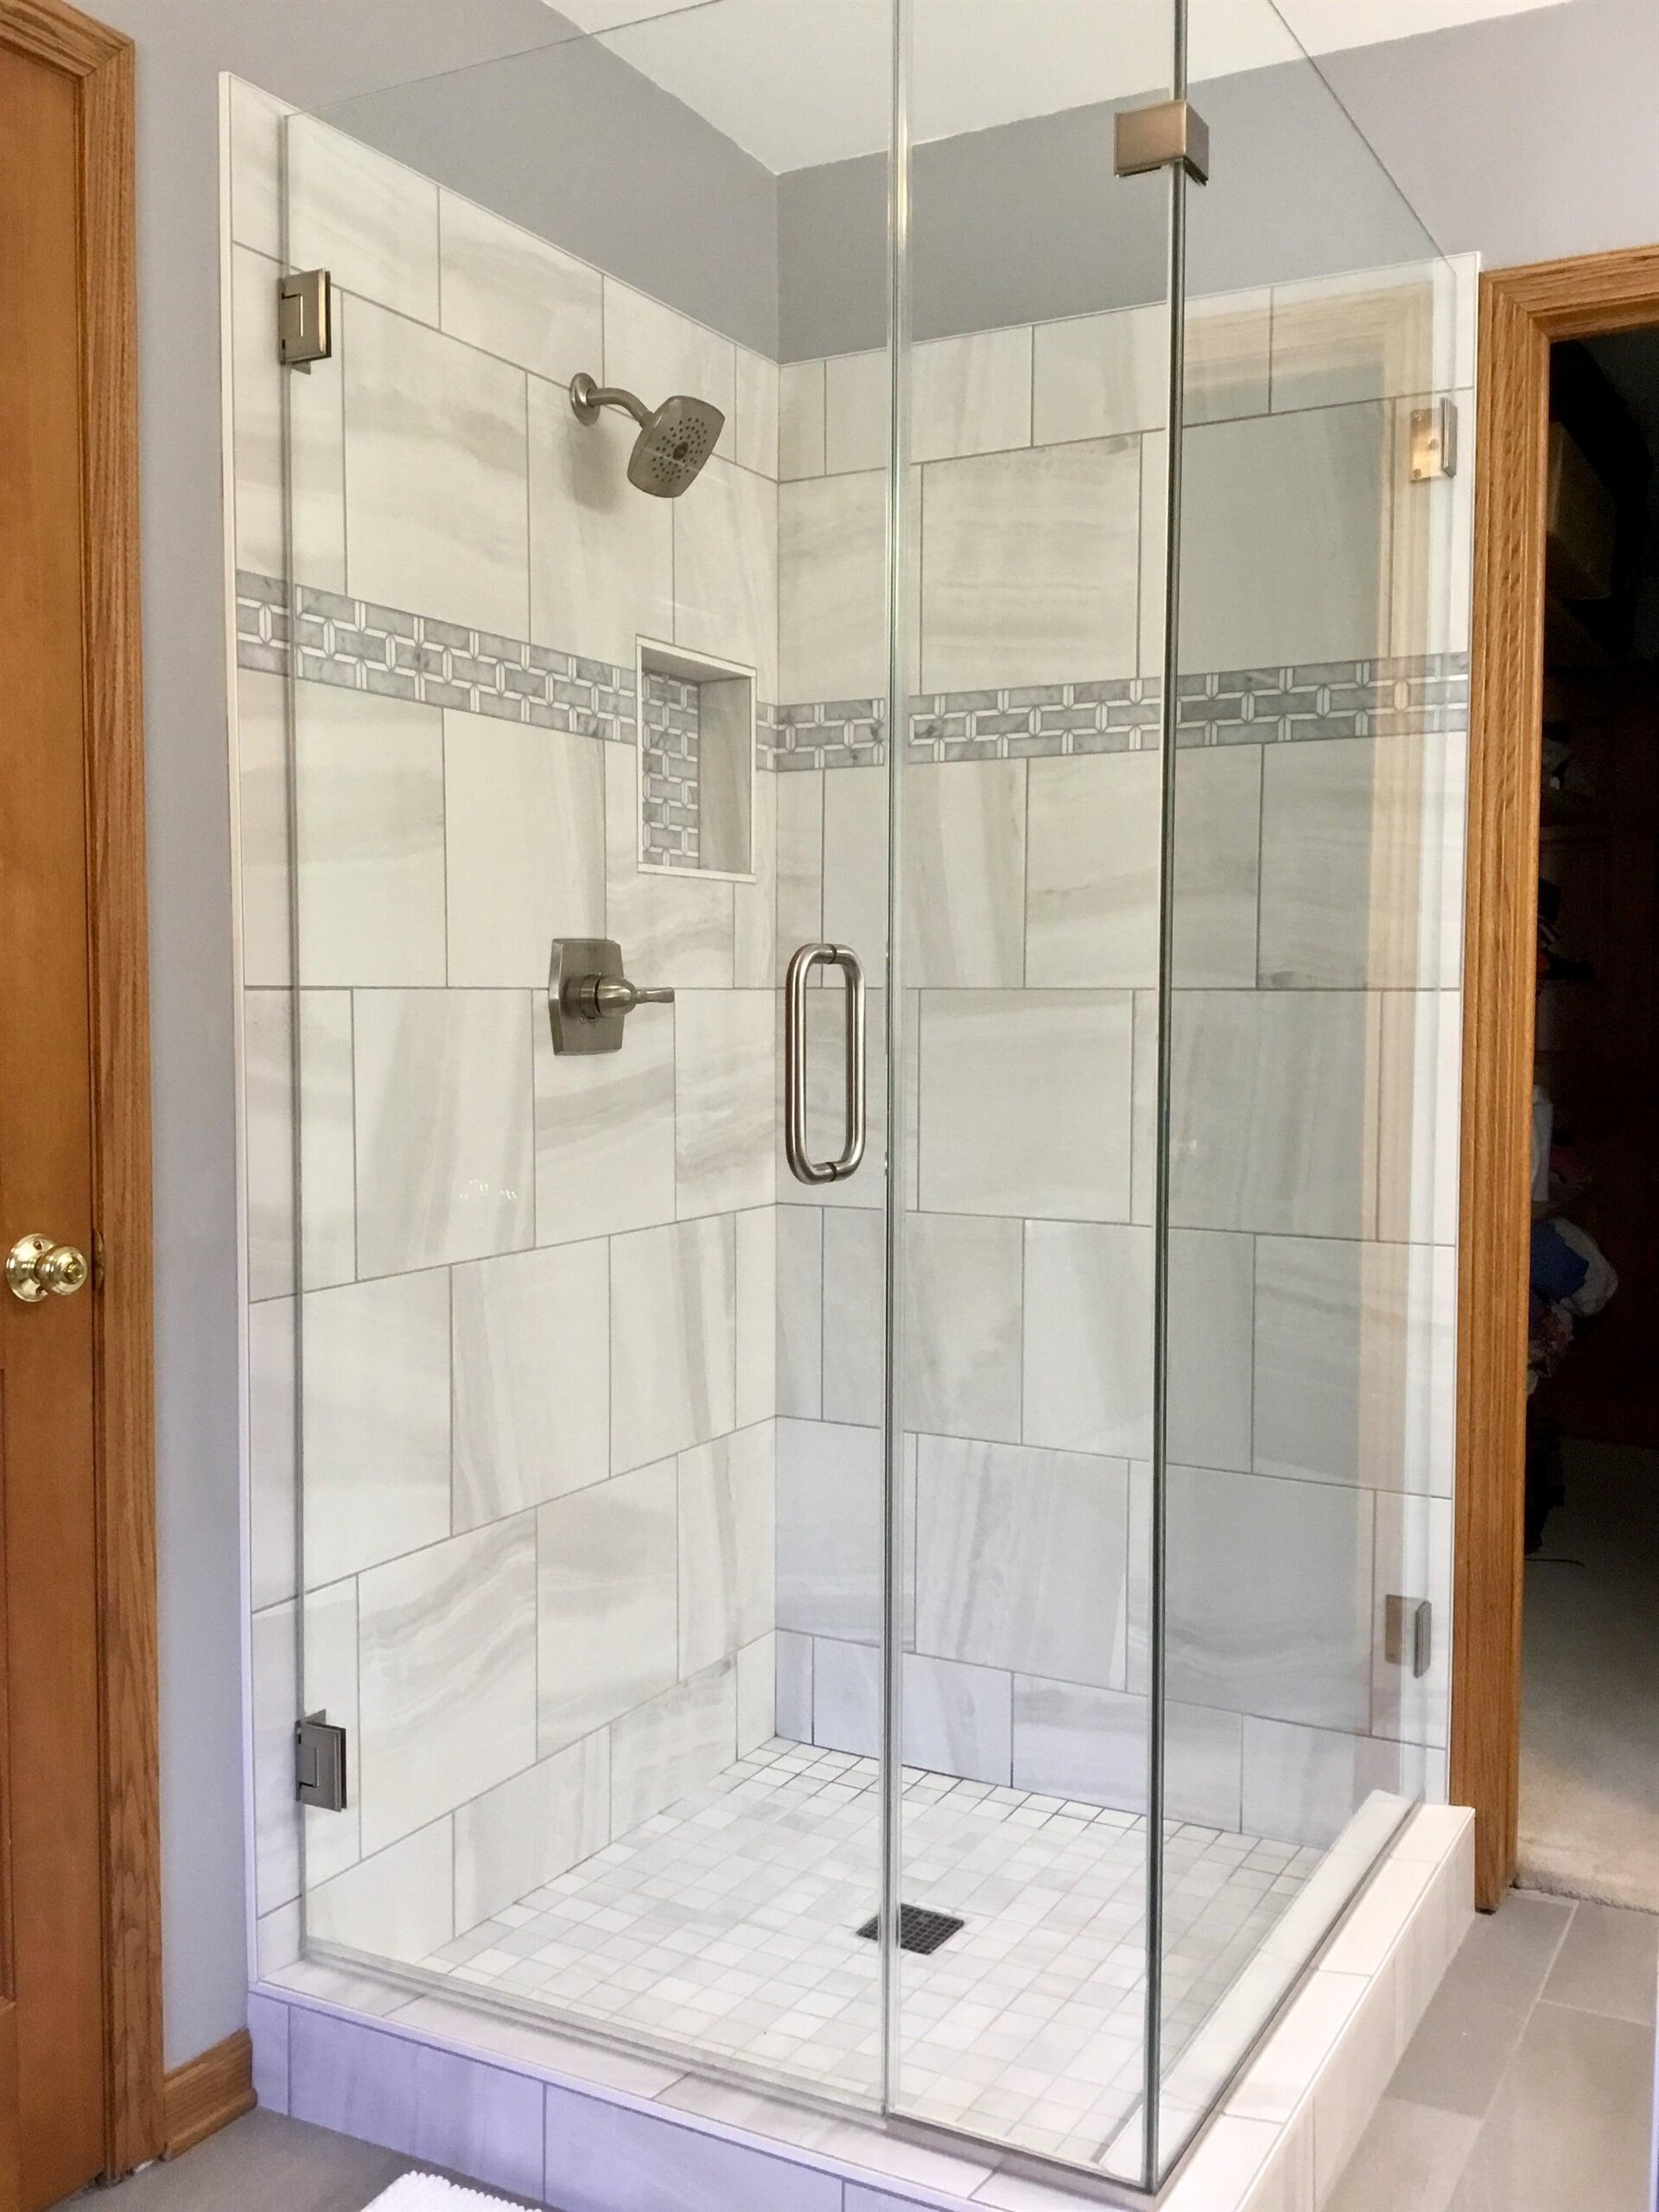 Harrington Bathroom remodel- Tiny 3